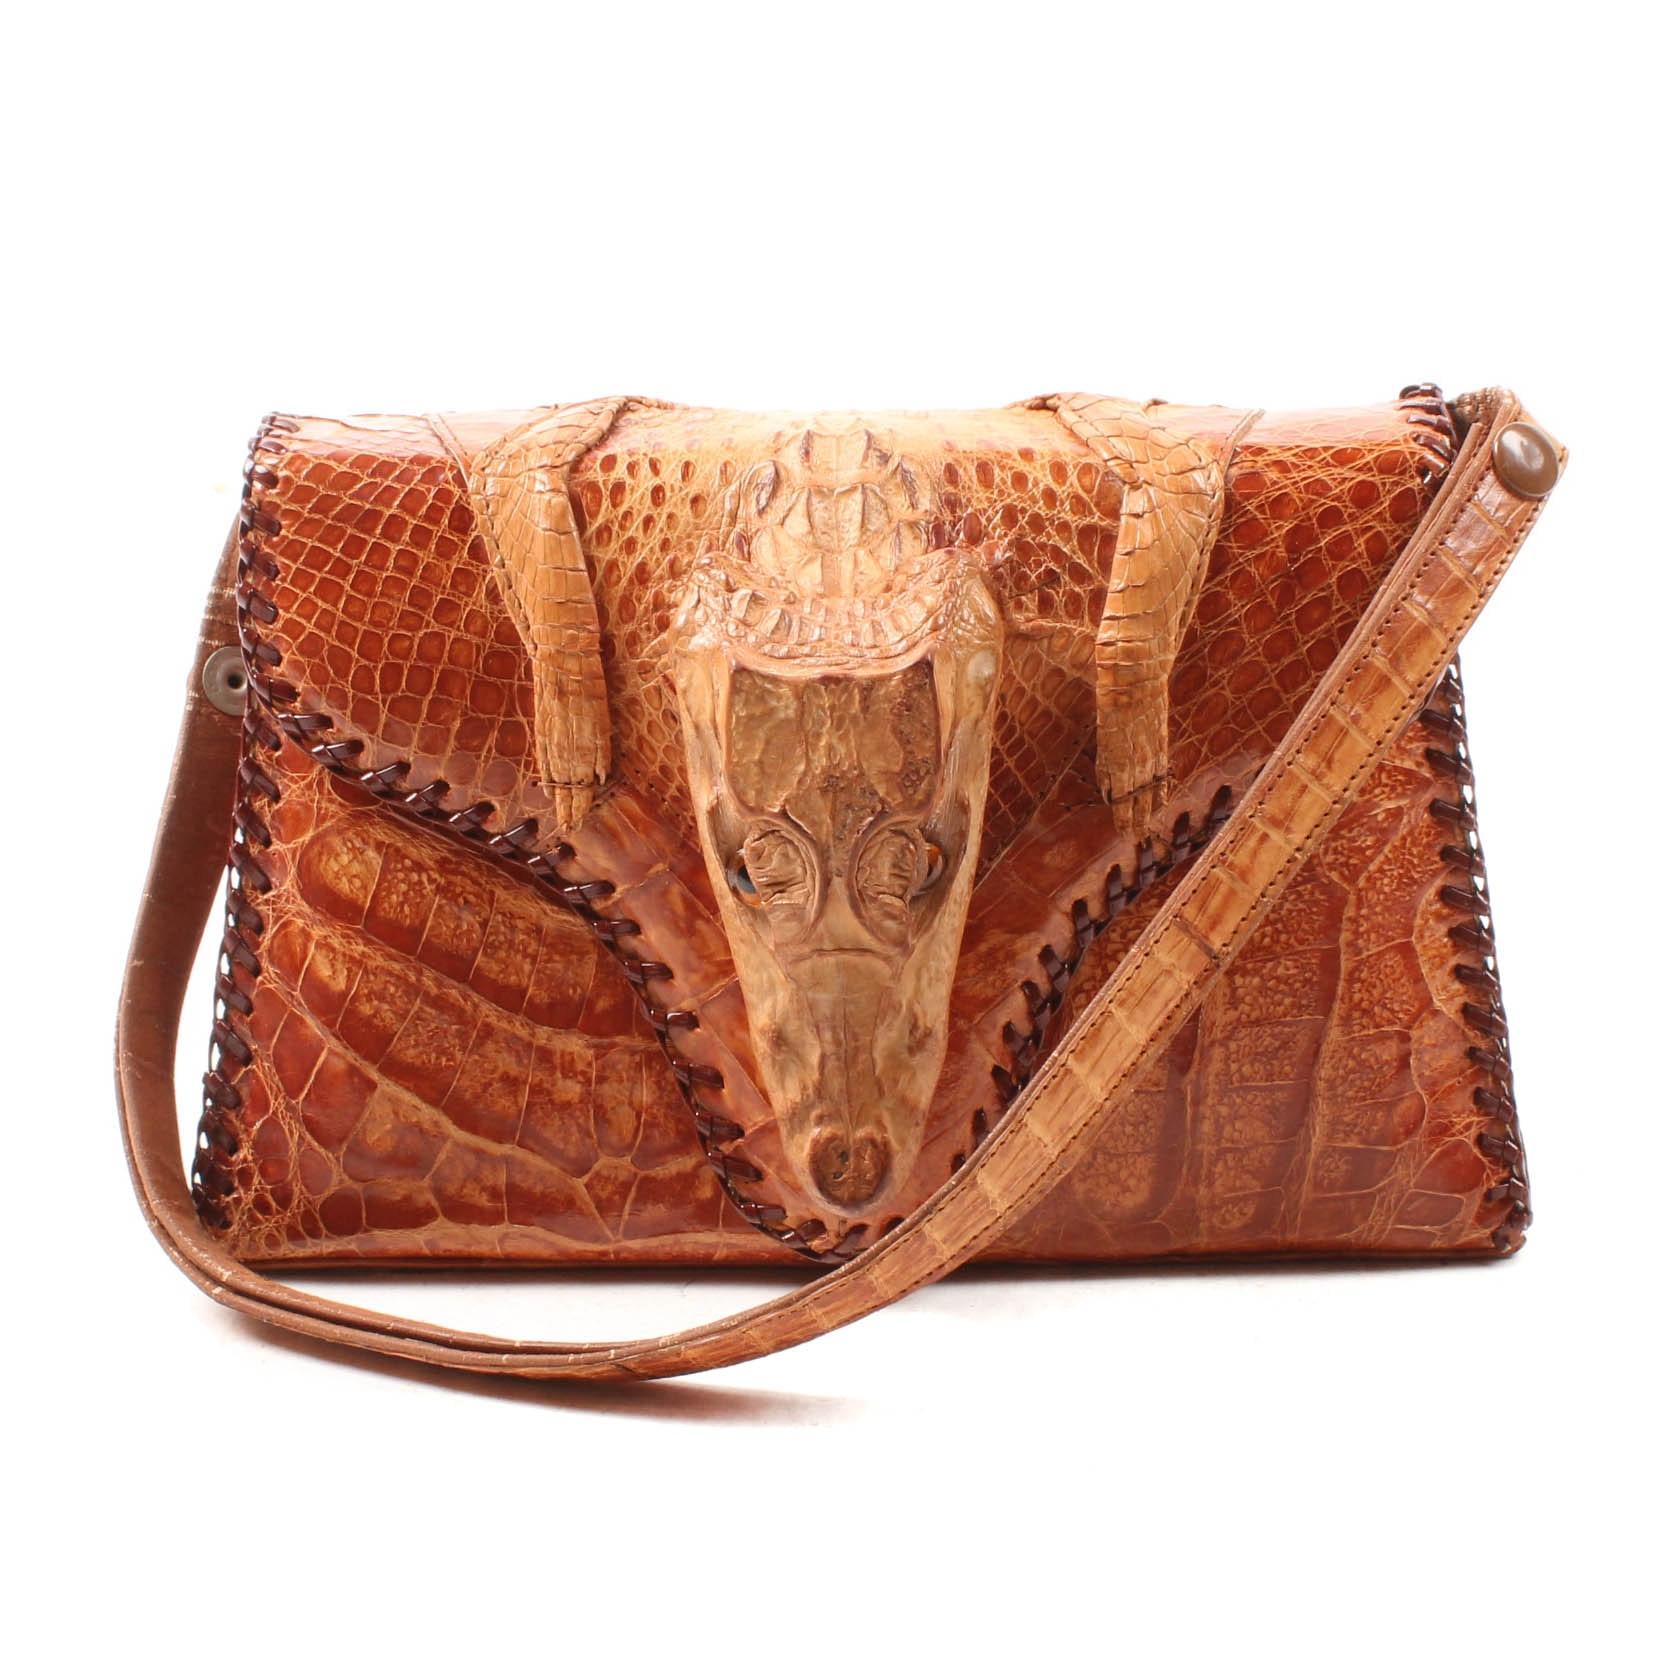 Vintage Caiman Skin and Leather Handbag